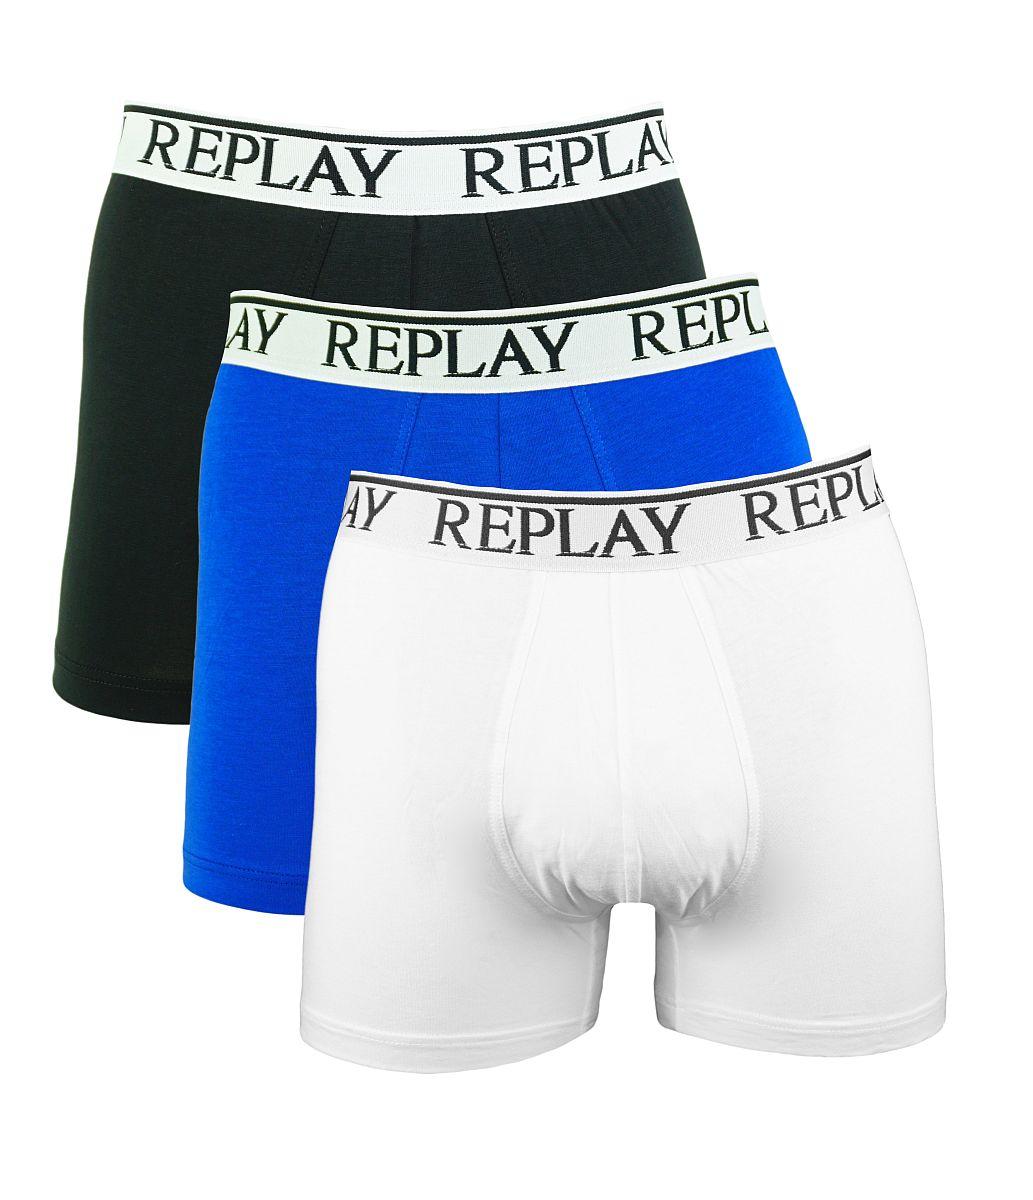 Replay 3er Pack Shorts Boxershorts M605001 E55 schwarz, blau, weiss W18-RY1